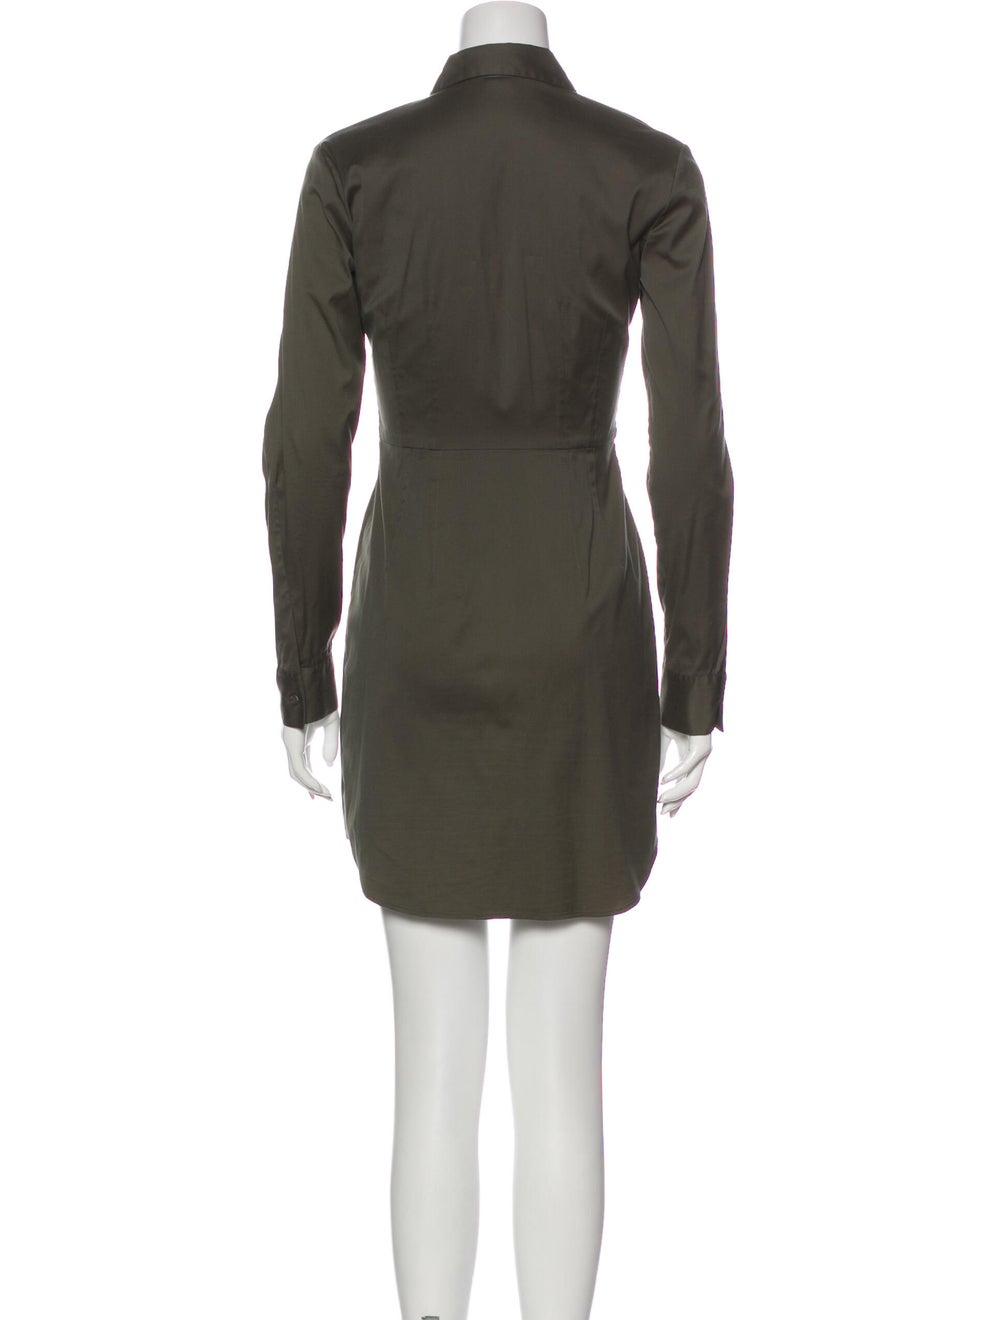 Theory Mini Dress Green - image 3